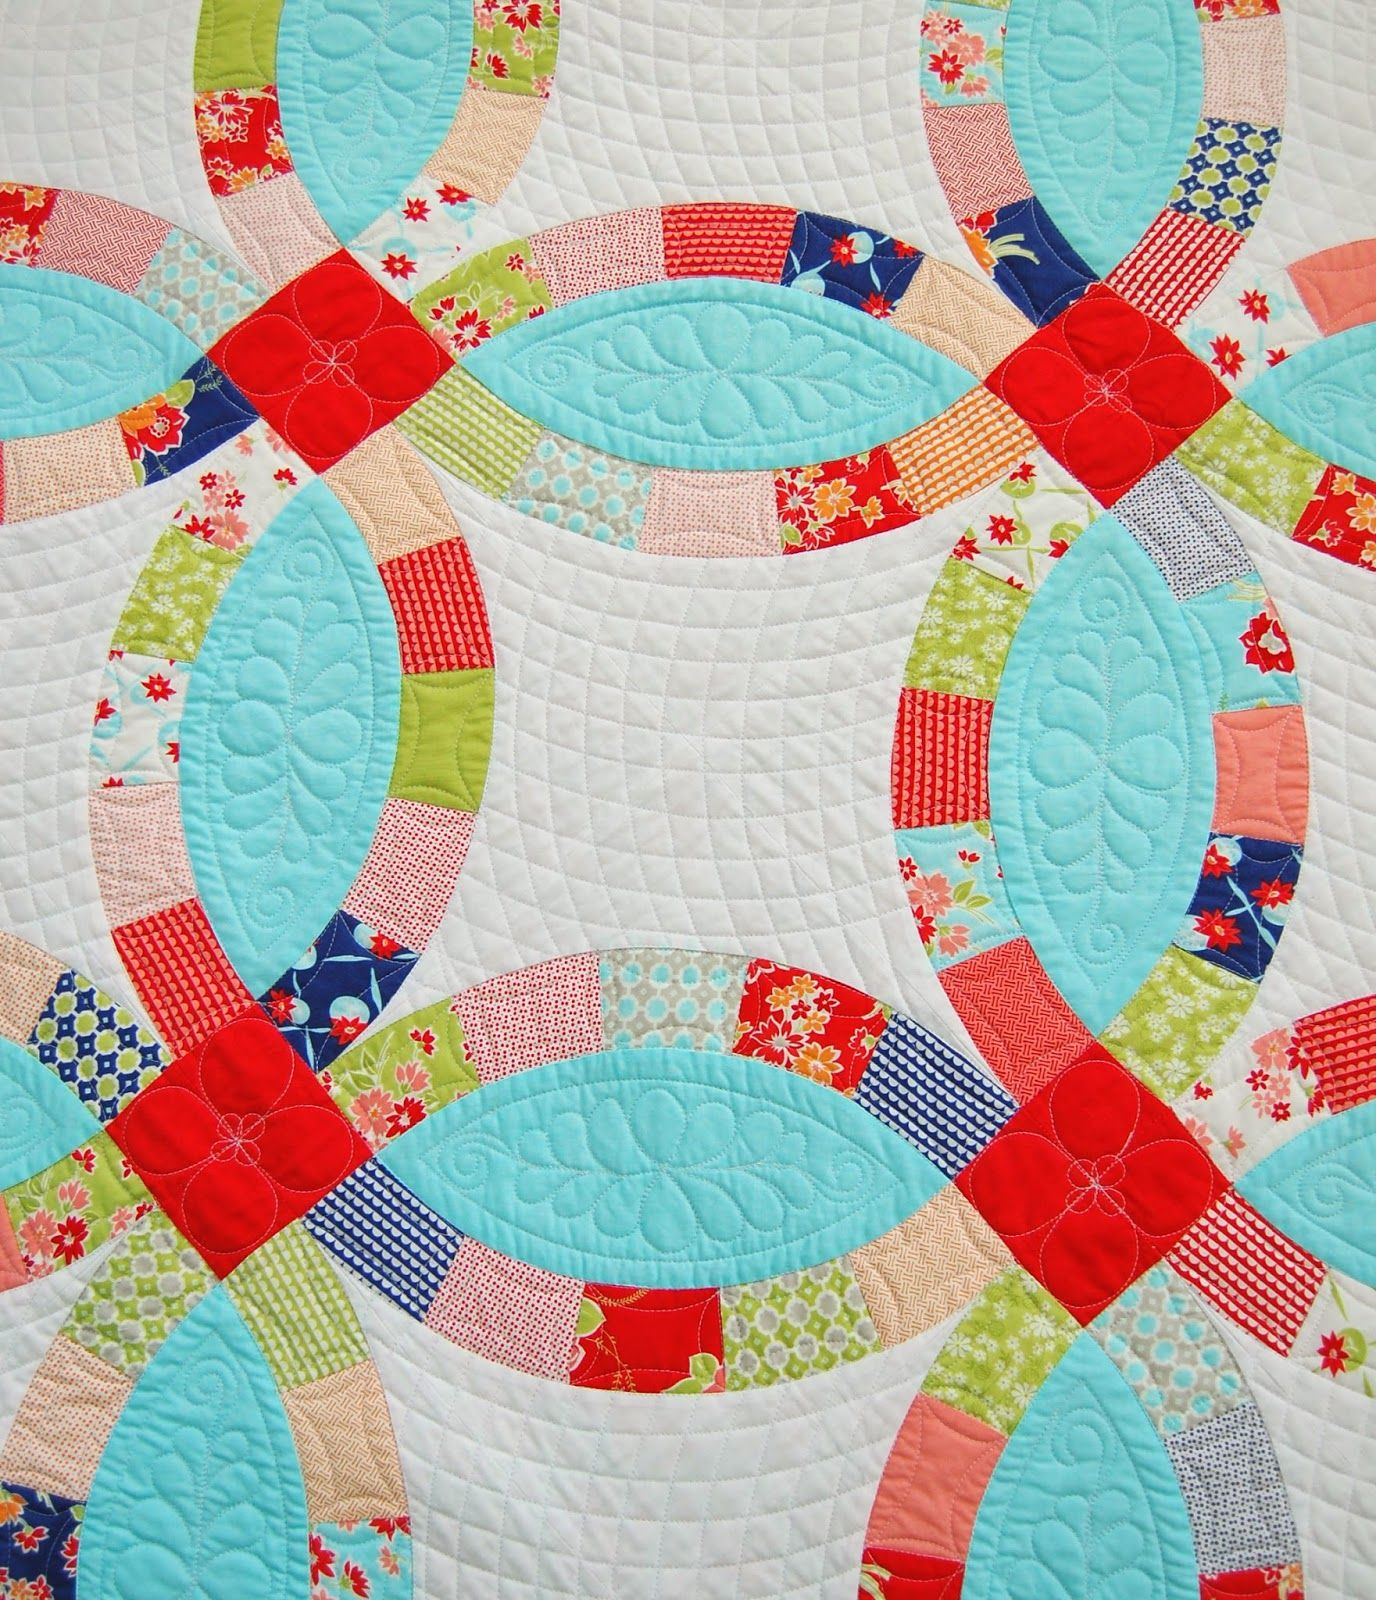 Cotton Waynew Double wedding ring quilt pattern. LOVE it